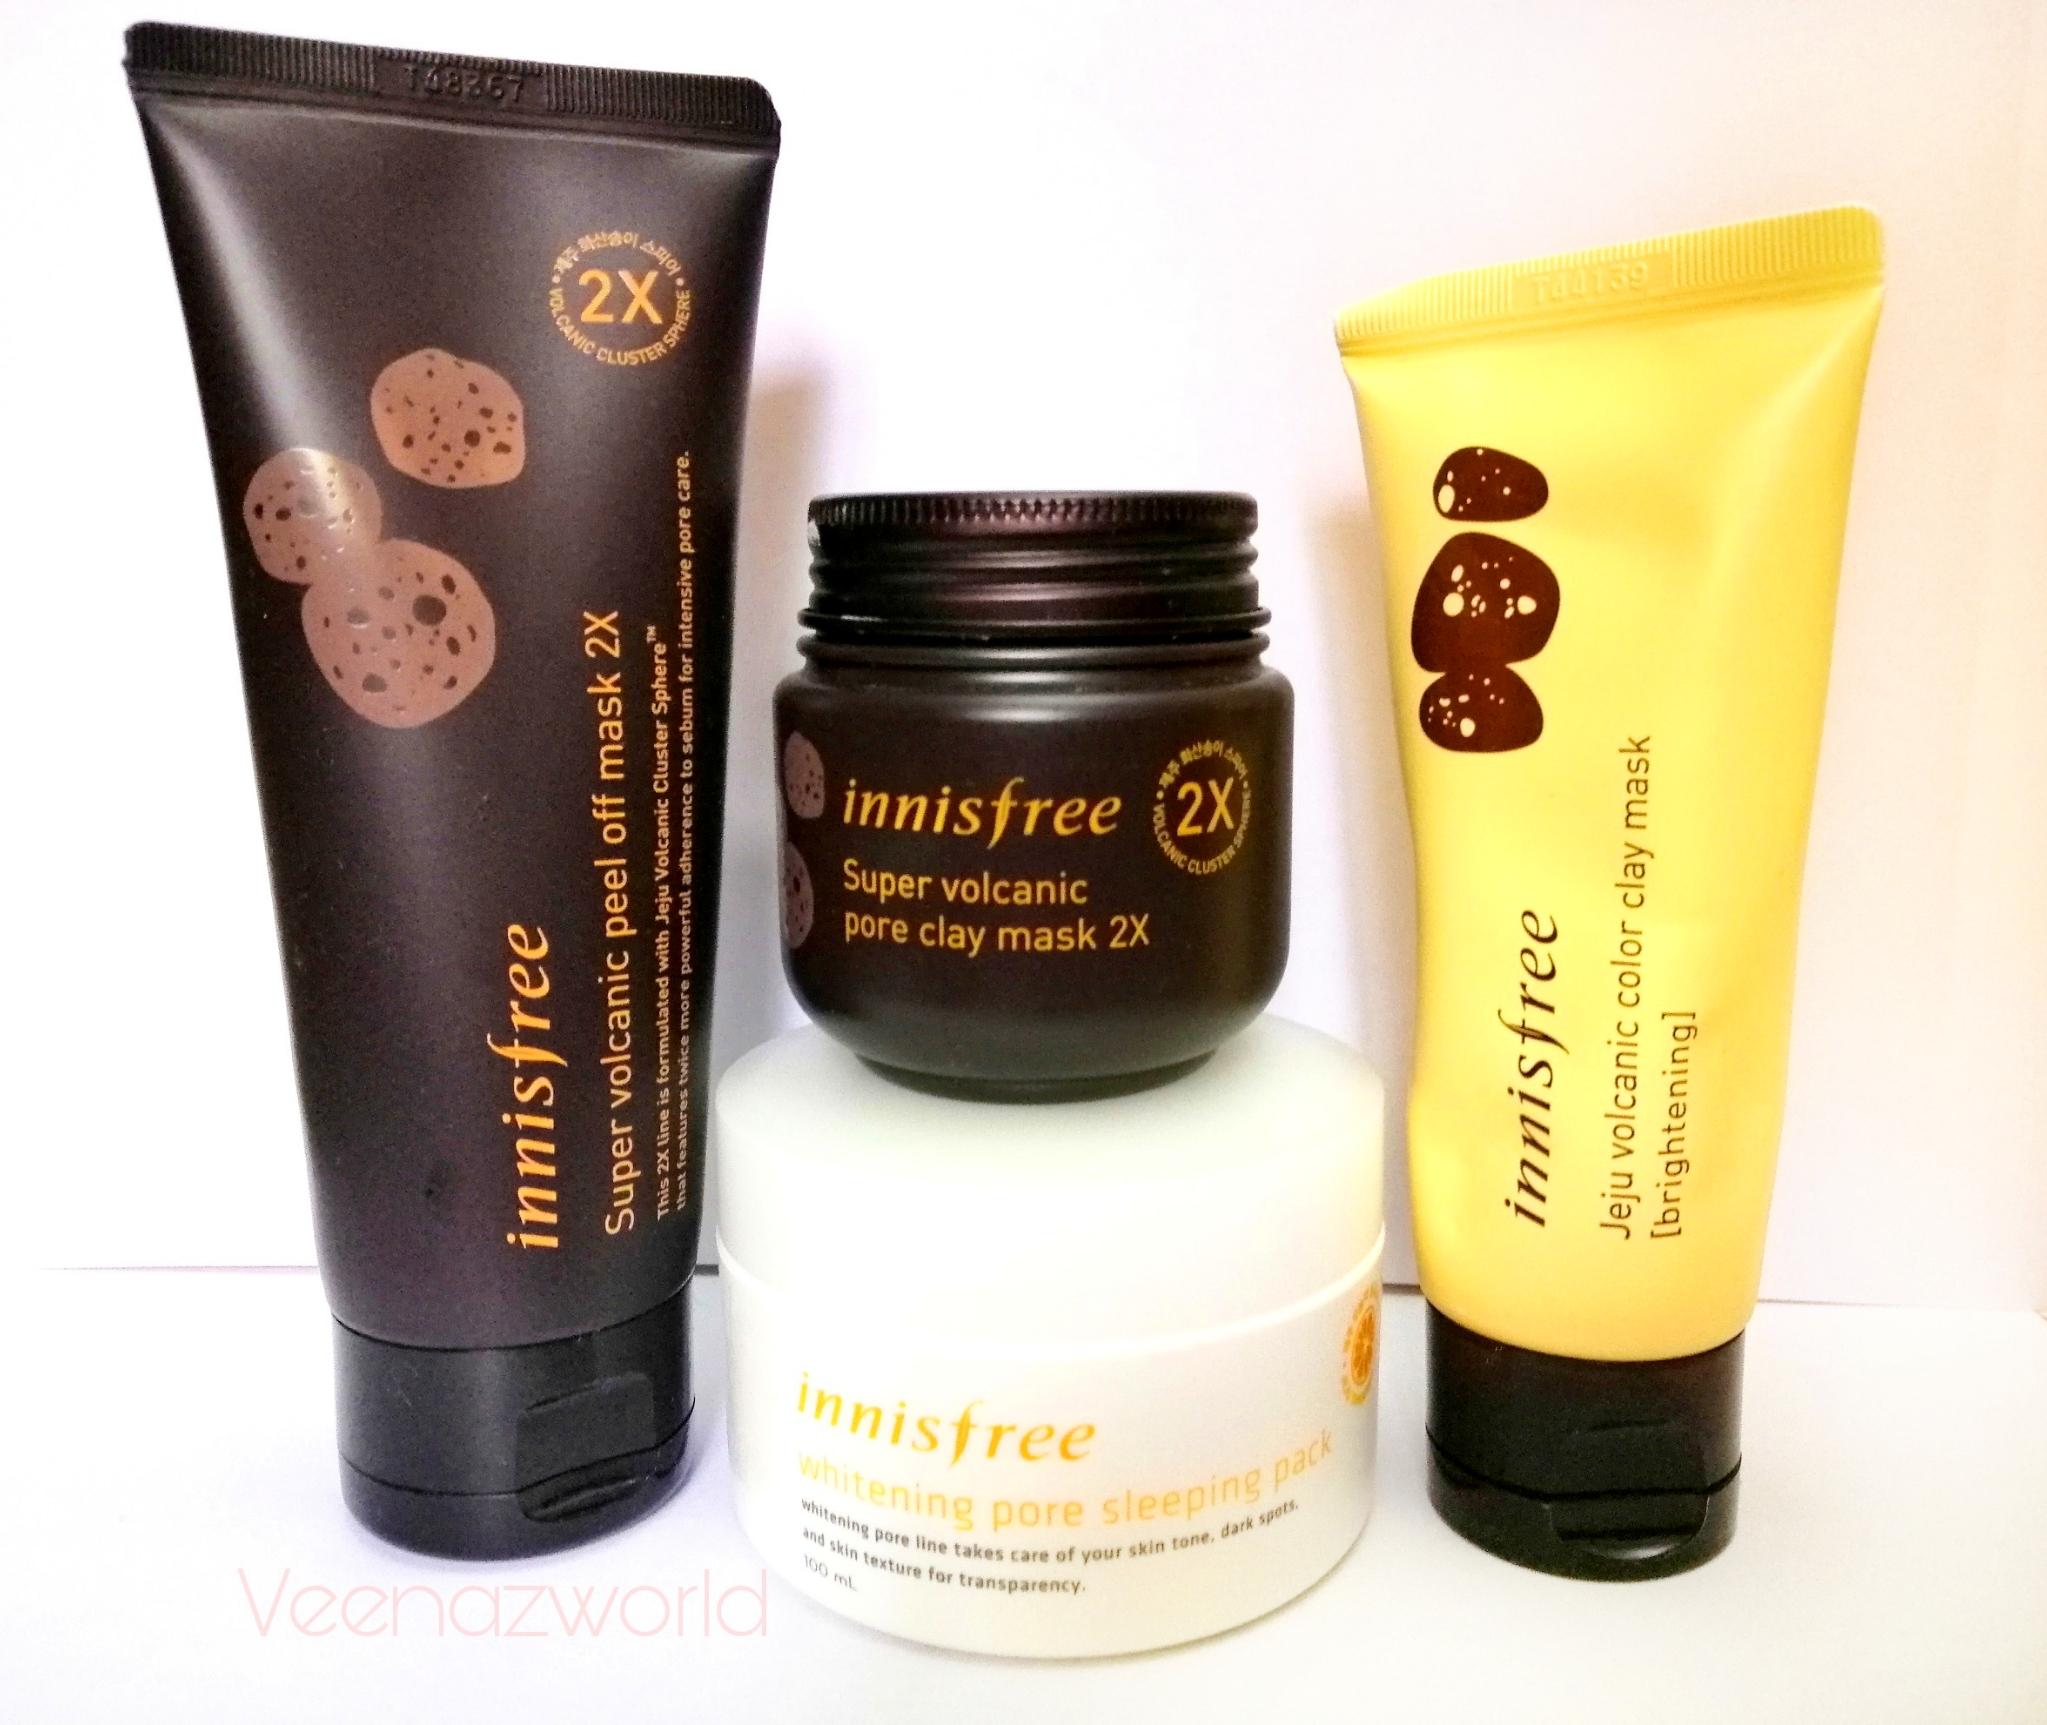 innisfreeworls, innisfree, masks, korean skincare, korean facemask